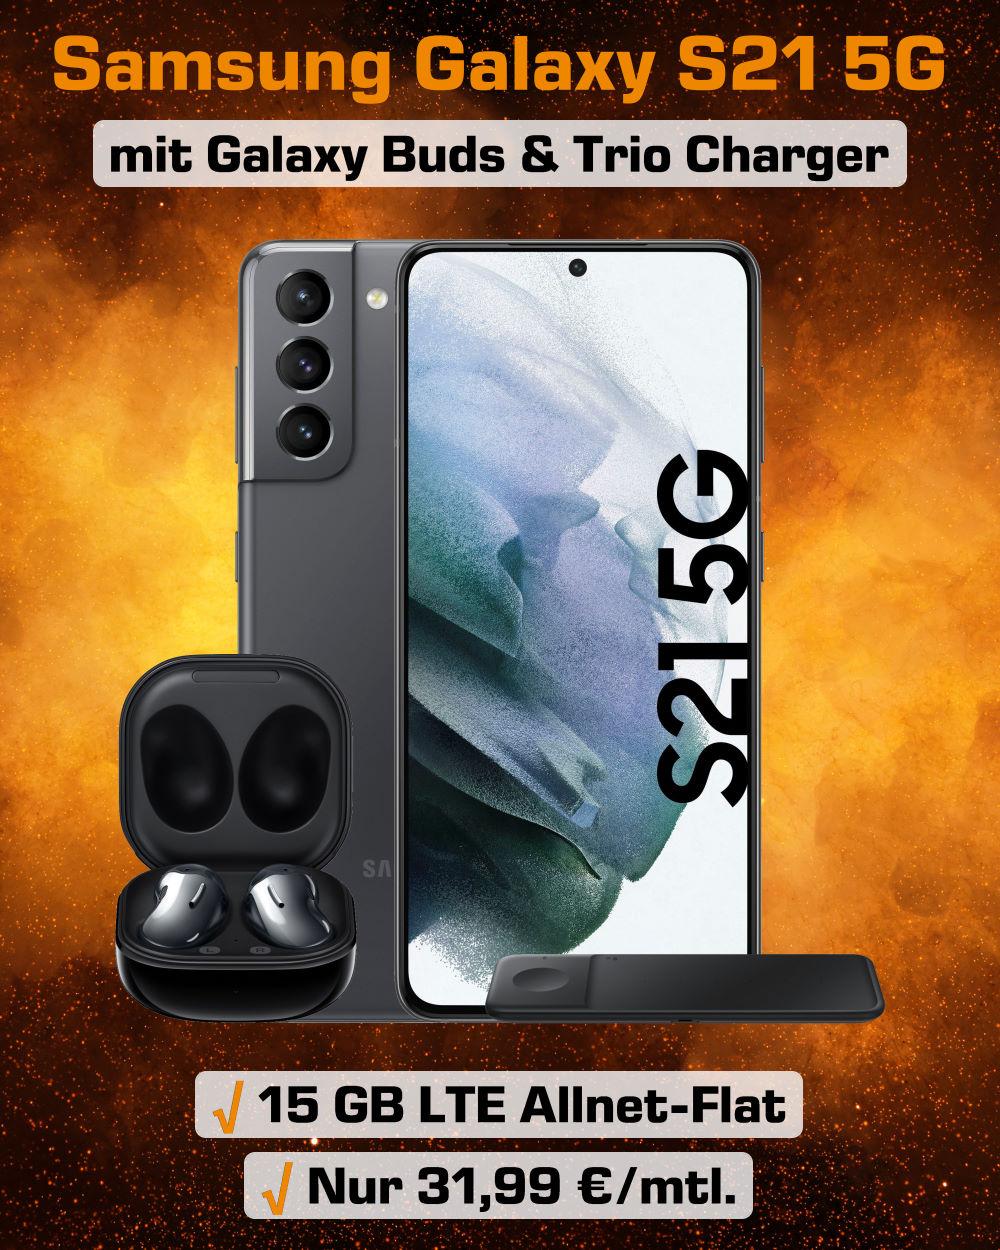 Galaxy S21 5G Angebot inkl. Galaxy Buds Live, Trio Charger und 15 GB LTE Allnet-Flat